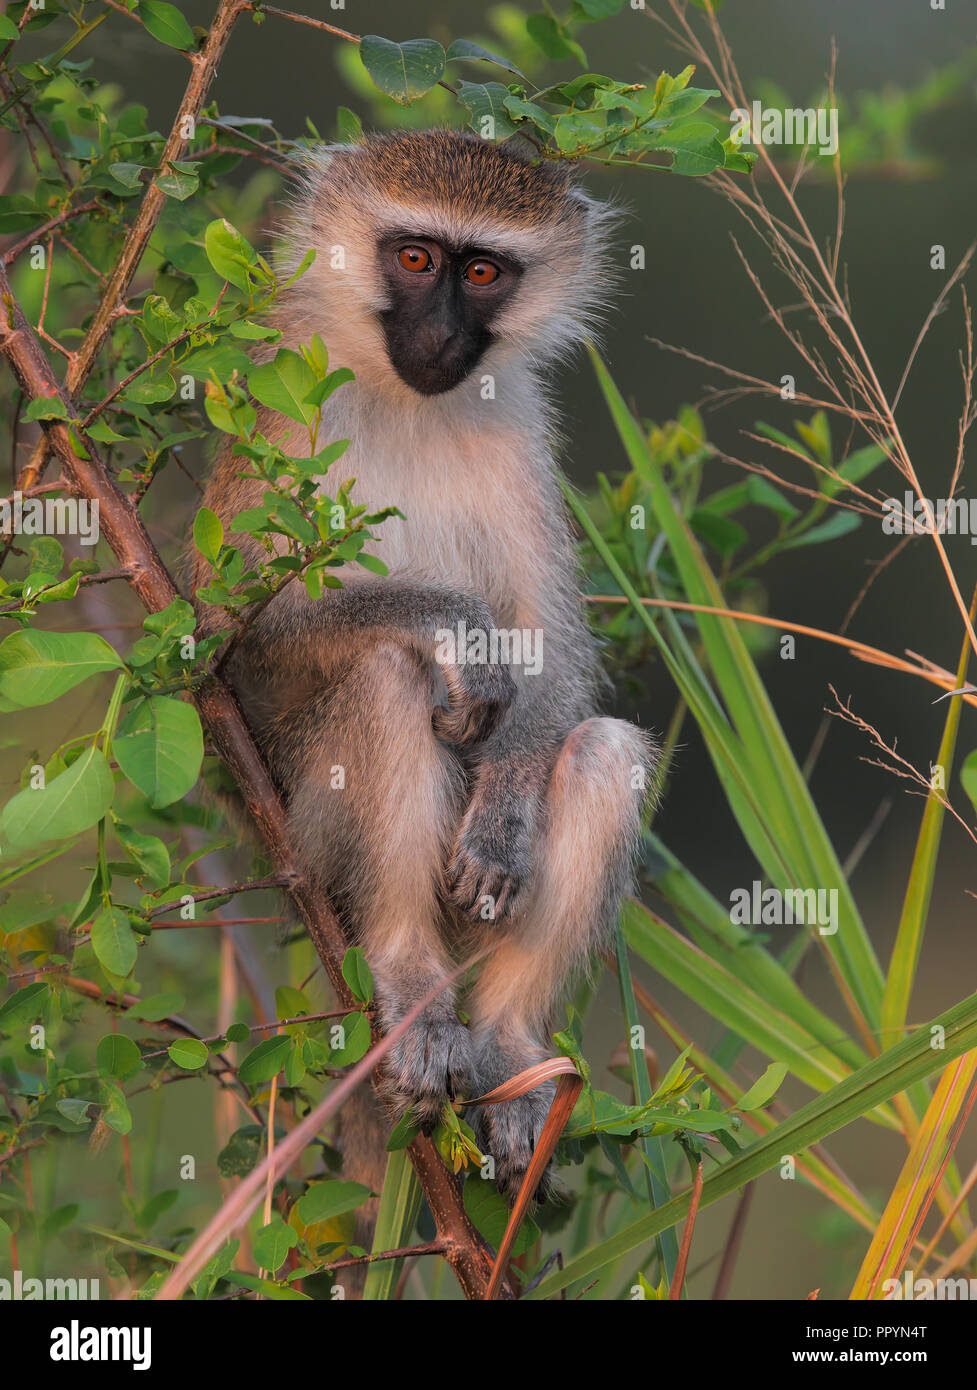 Grivet monkey - Stock Image